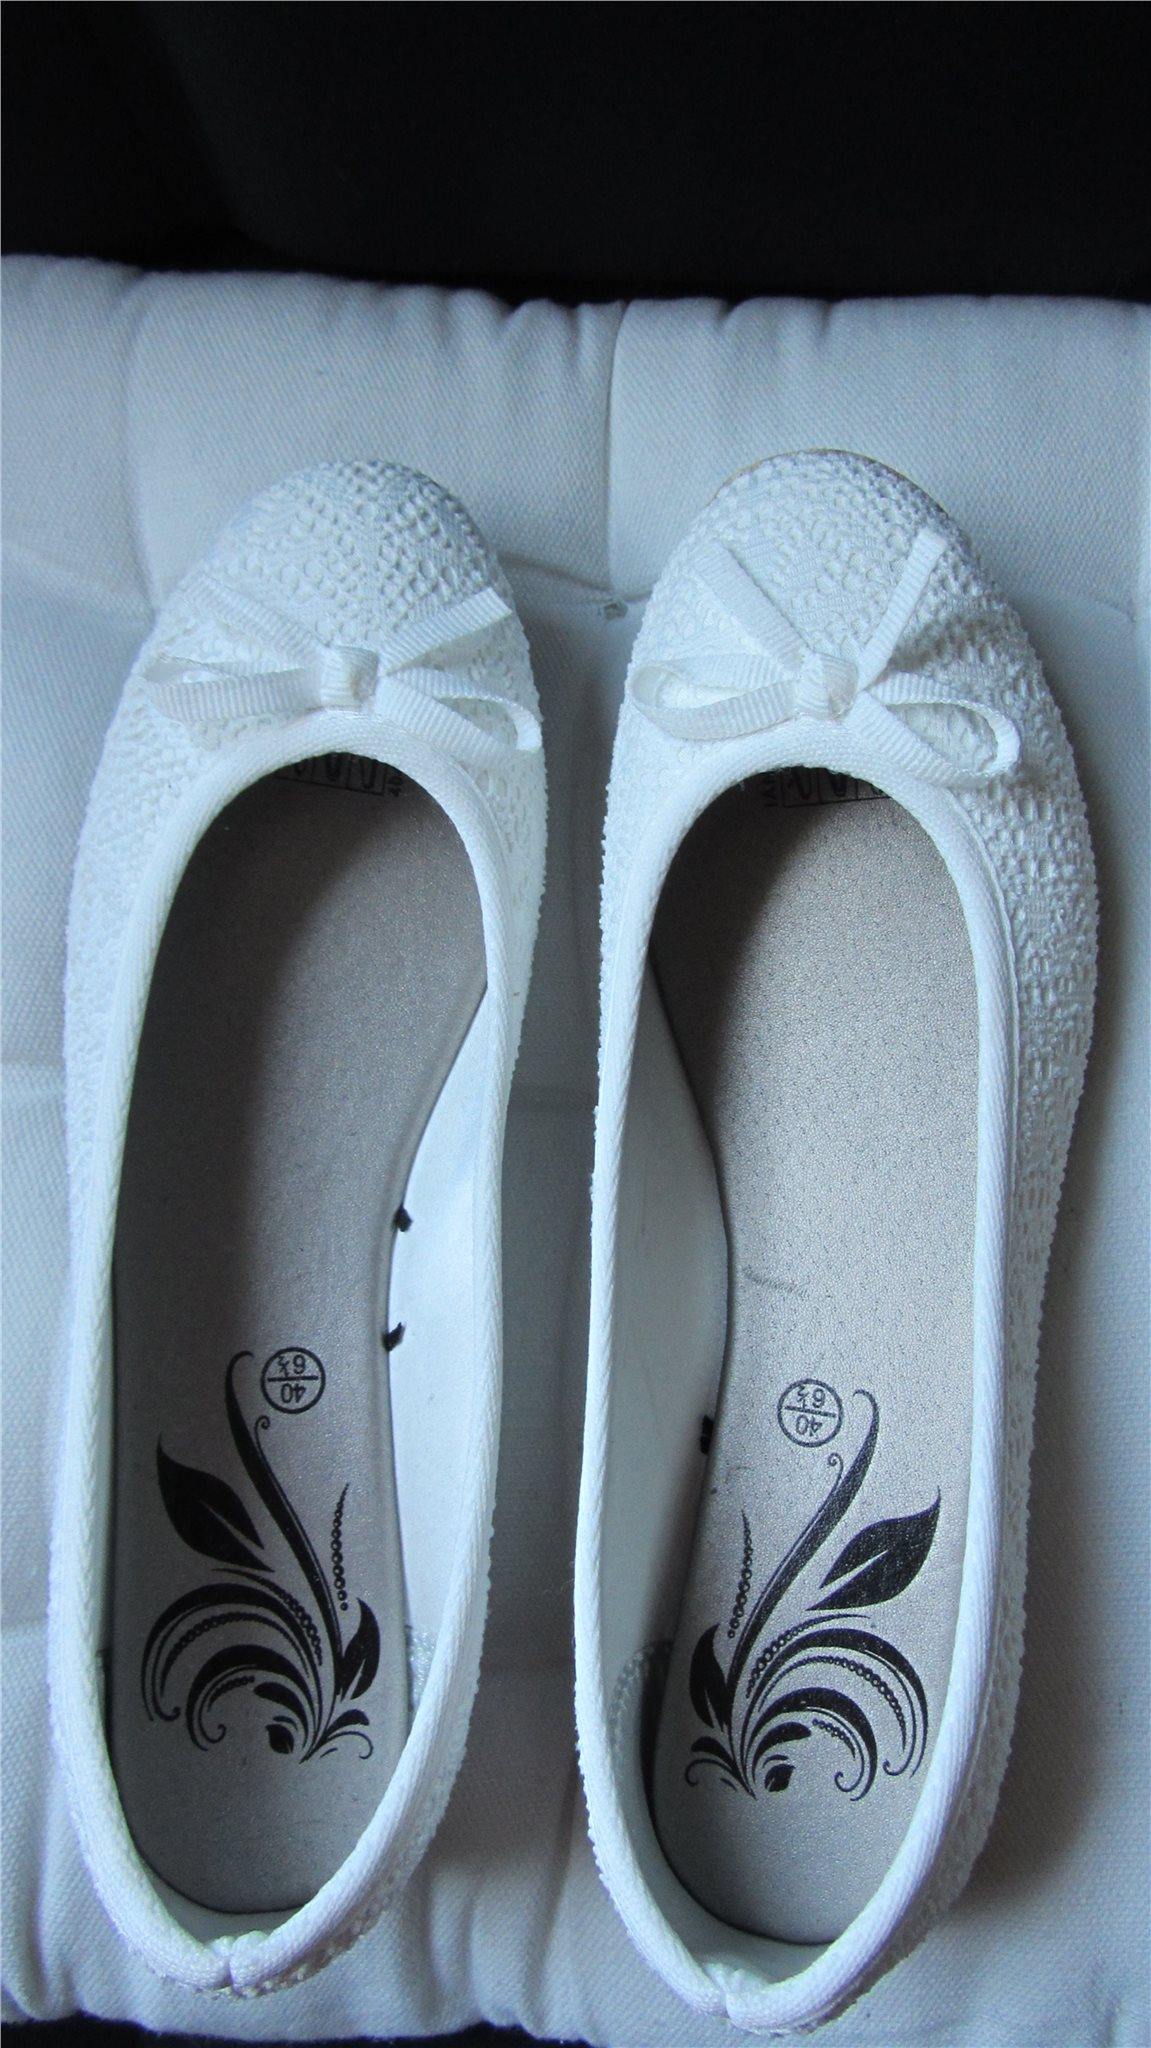 vita spets skor